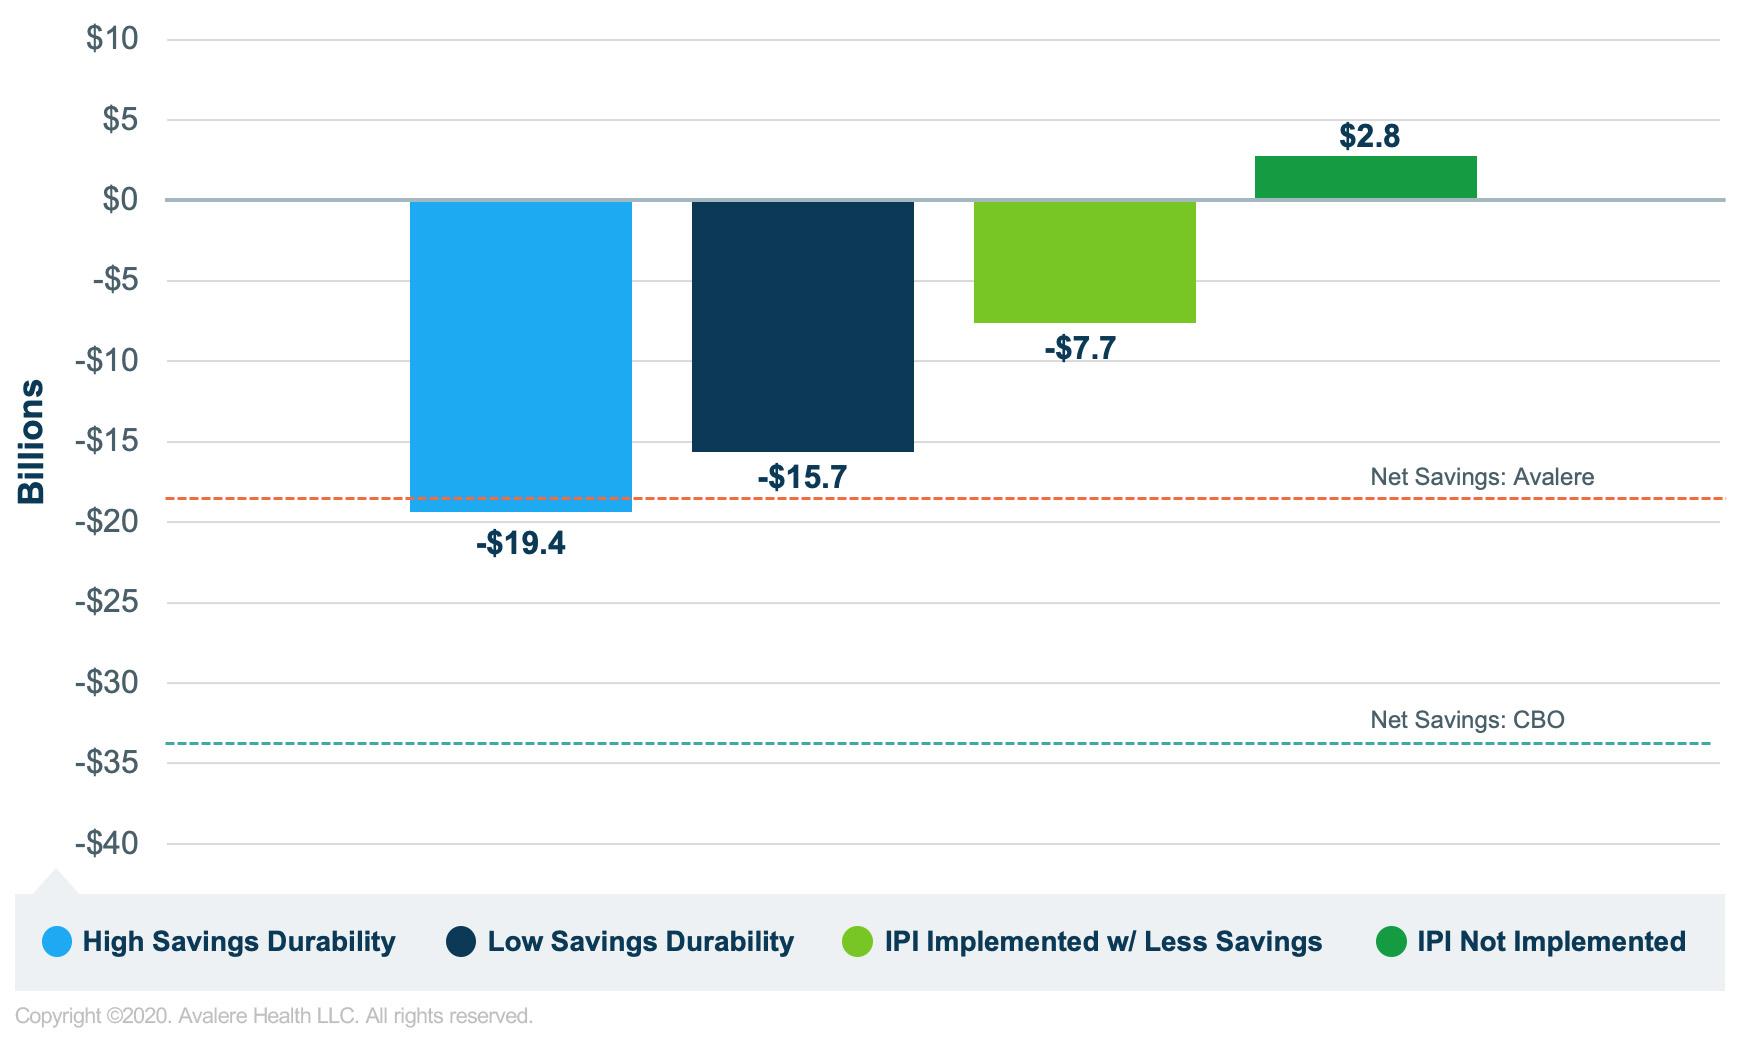 Figure 2. CMMI Demonstration Savings, Alternative Assumptions 2017-2026 (Billions)